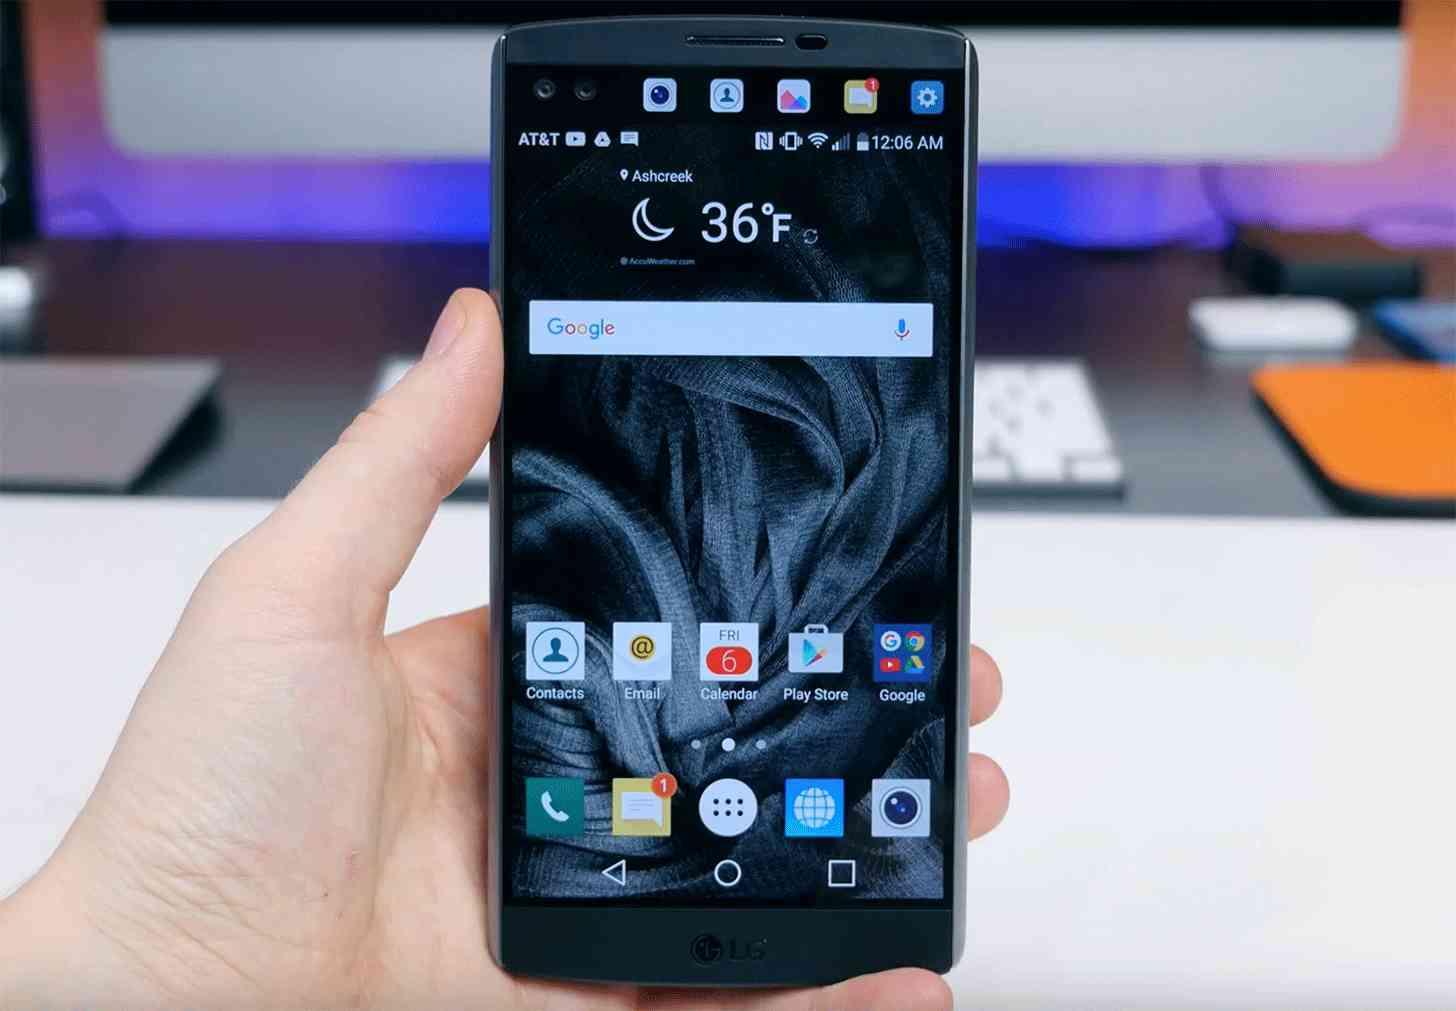 LG V10 hands on review